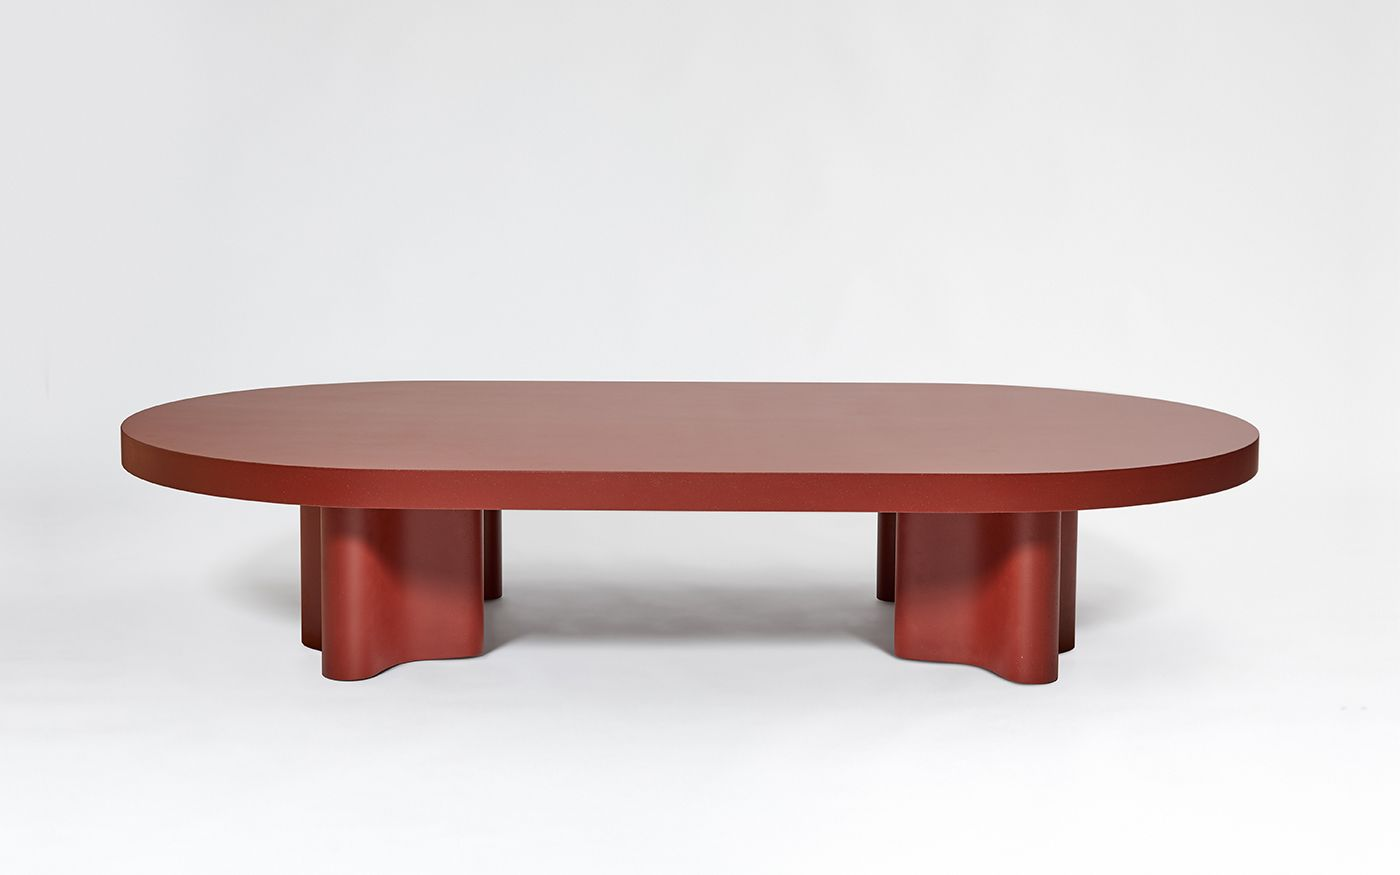 Galerie Kreo Galerie Kreo Azo Ovale Coffee Table 2017 Francois Bauchet Producer Galerie Kre Tiled Coffee Table Coffee Table White Round Coffee Table [ 875 x 1400 Pixel ]